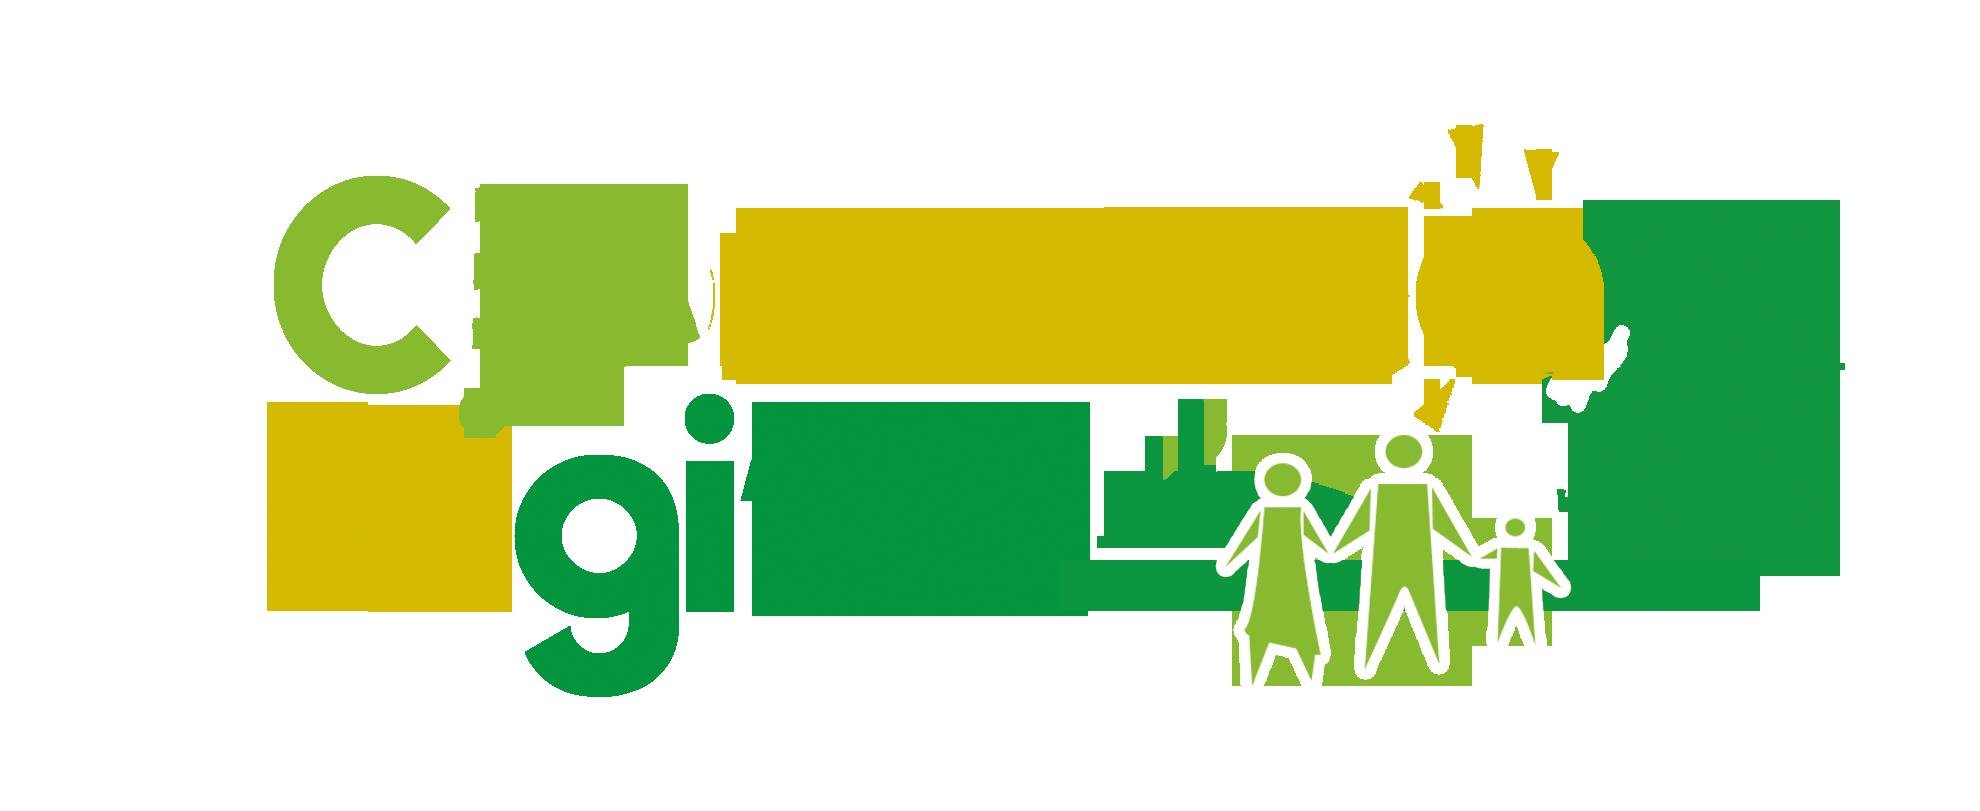 CoMarca Digital